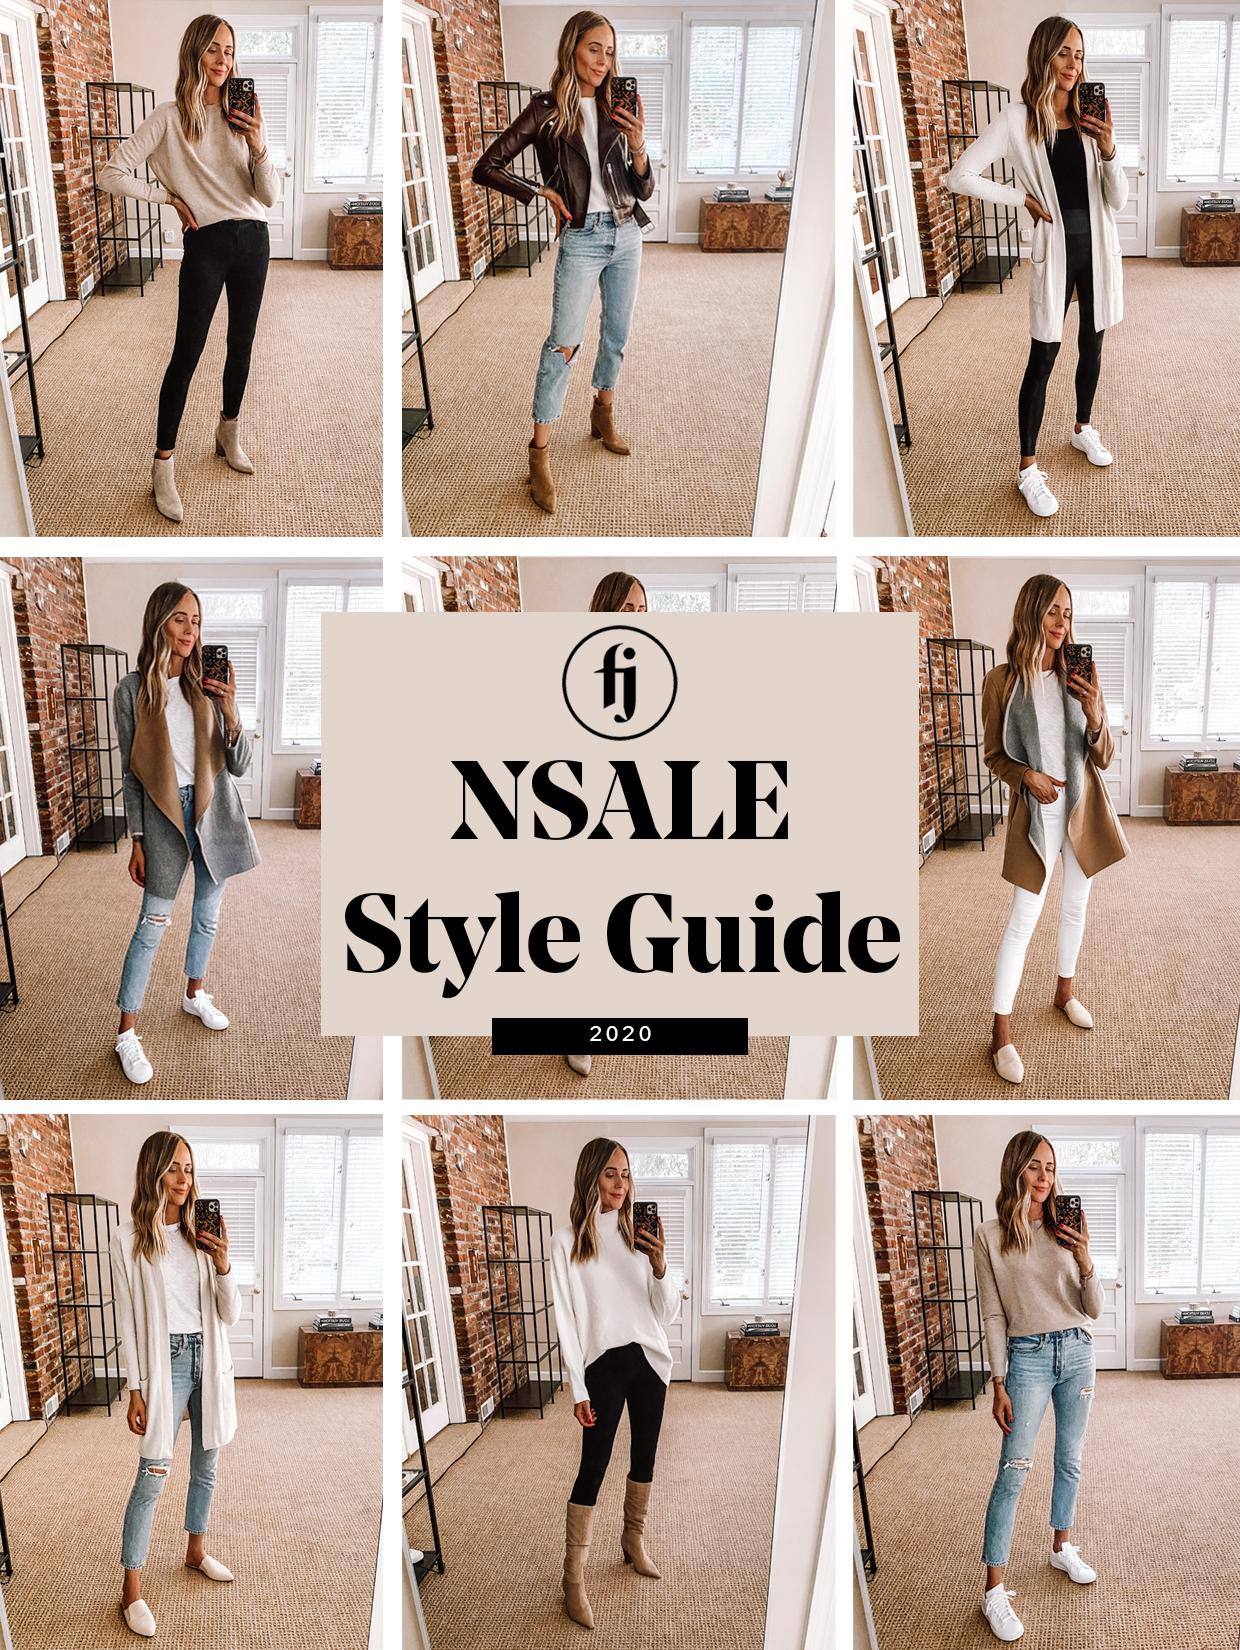 nsale outfit ideas